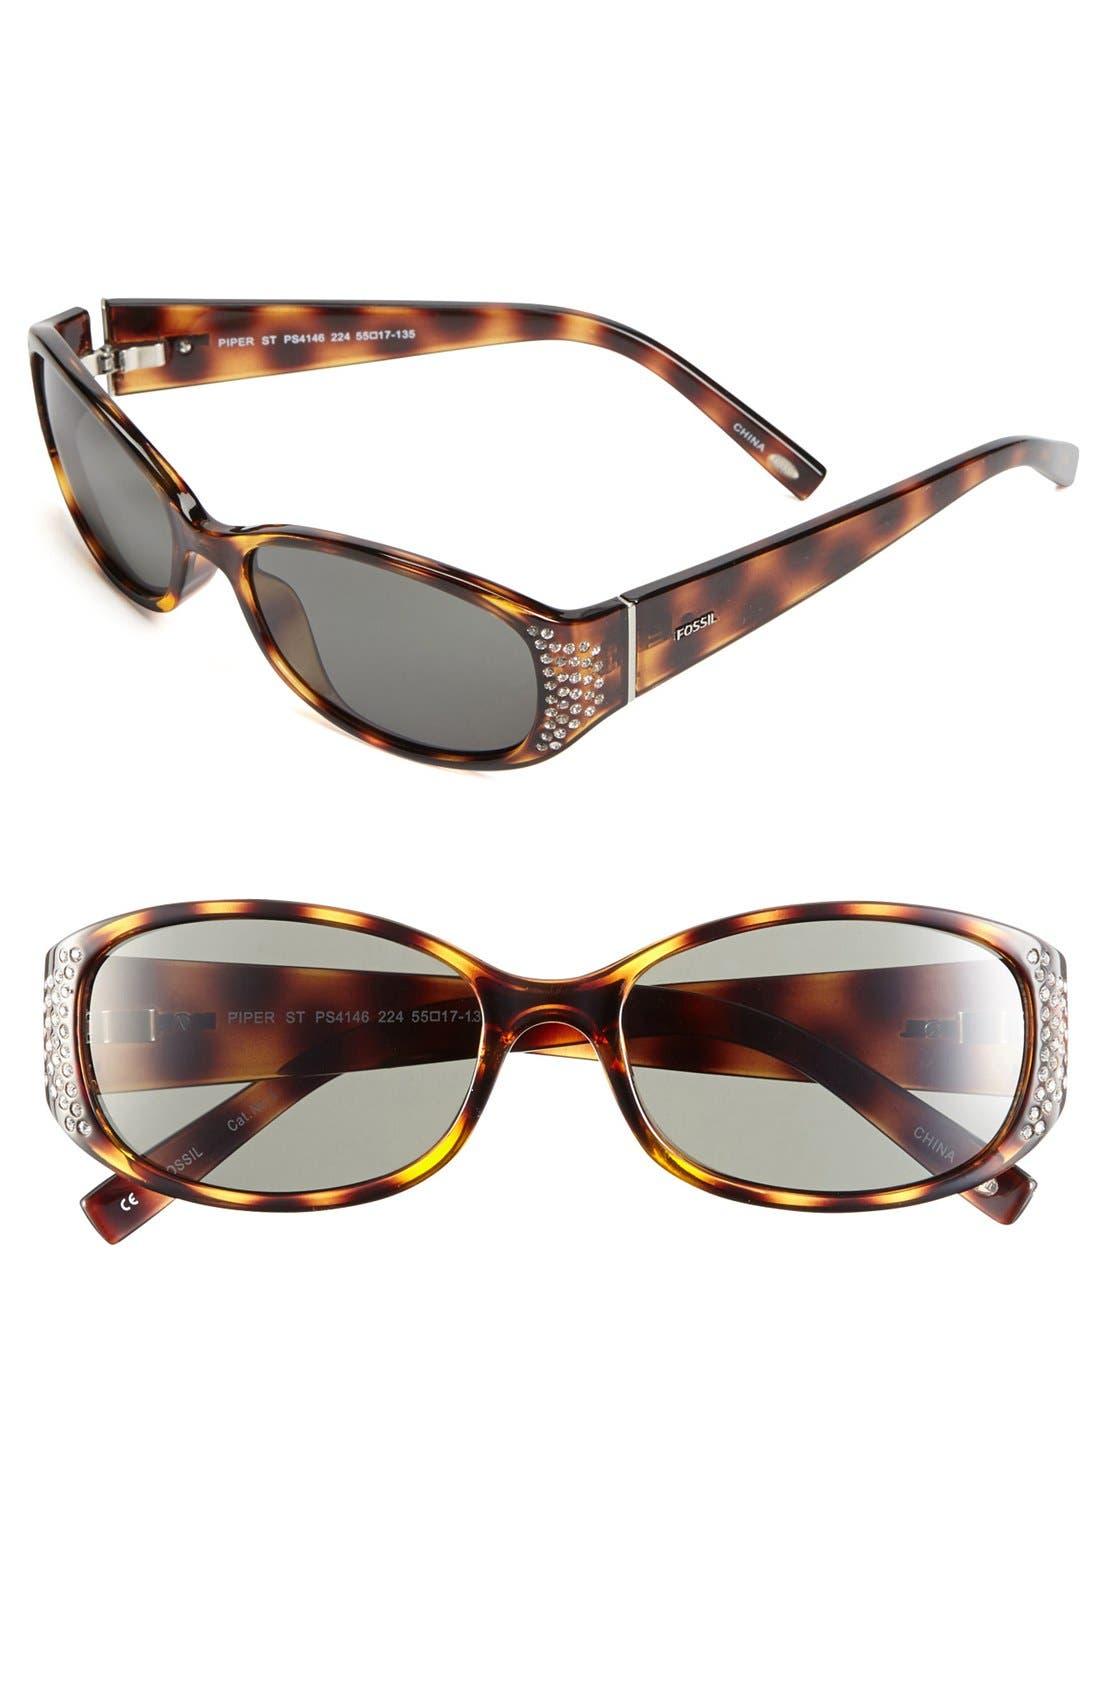 Main Image - Fossil 'Piper Street' 55mm Sunglasses